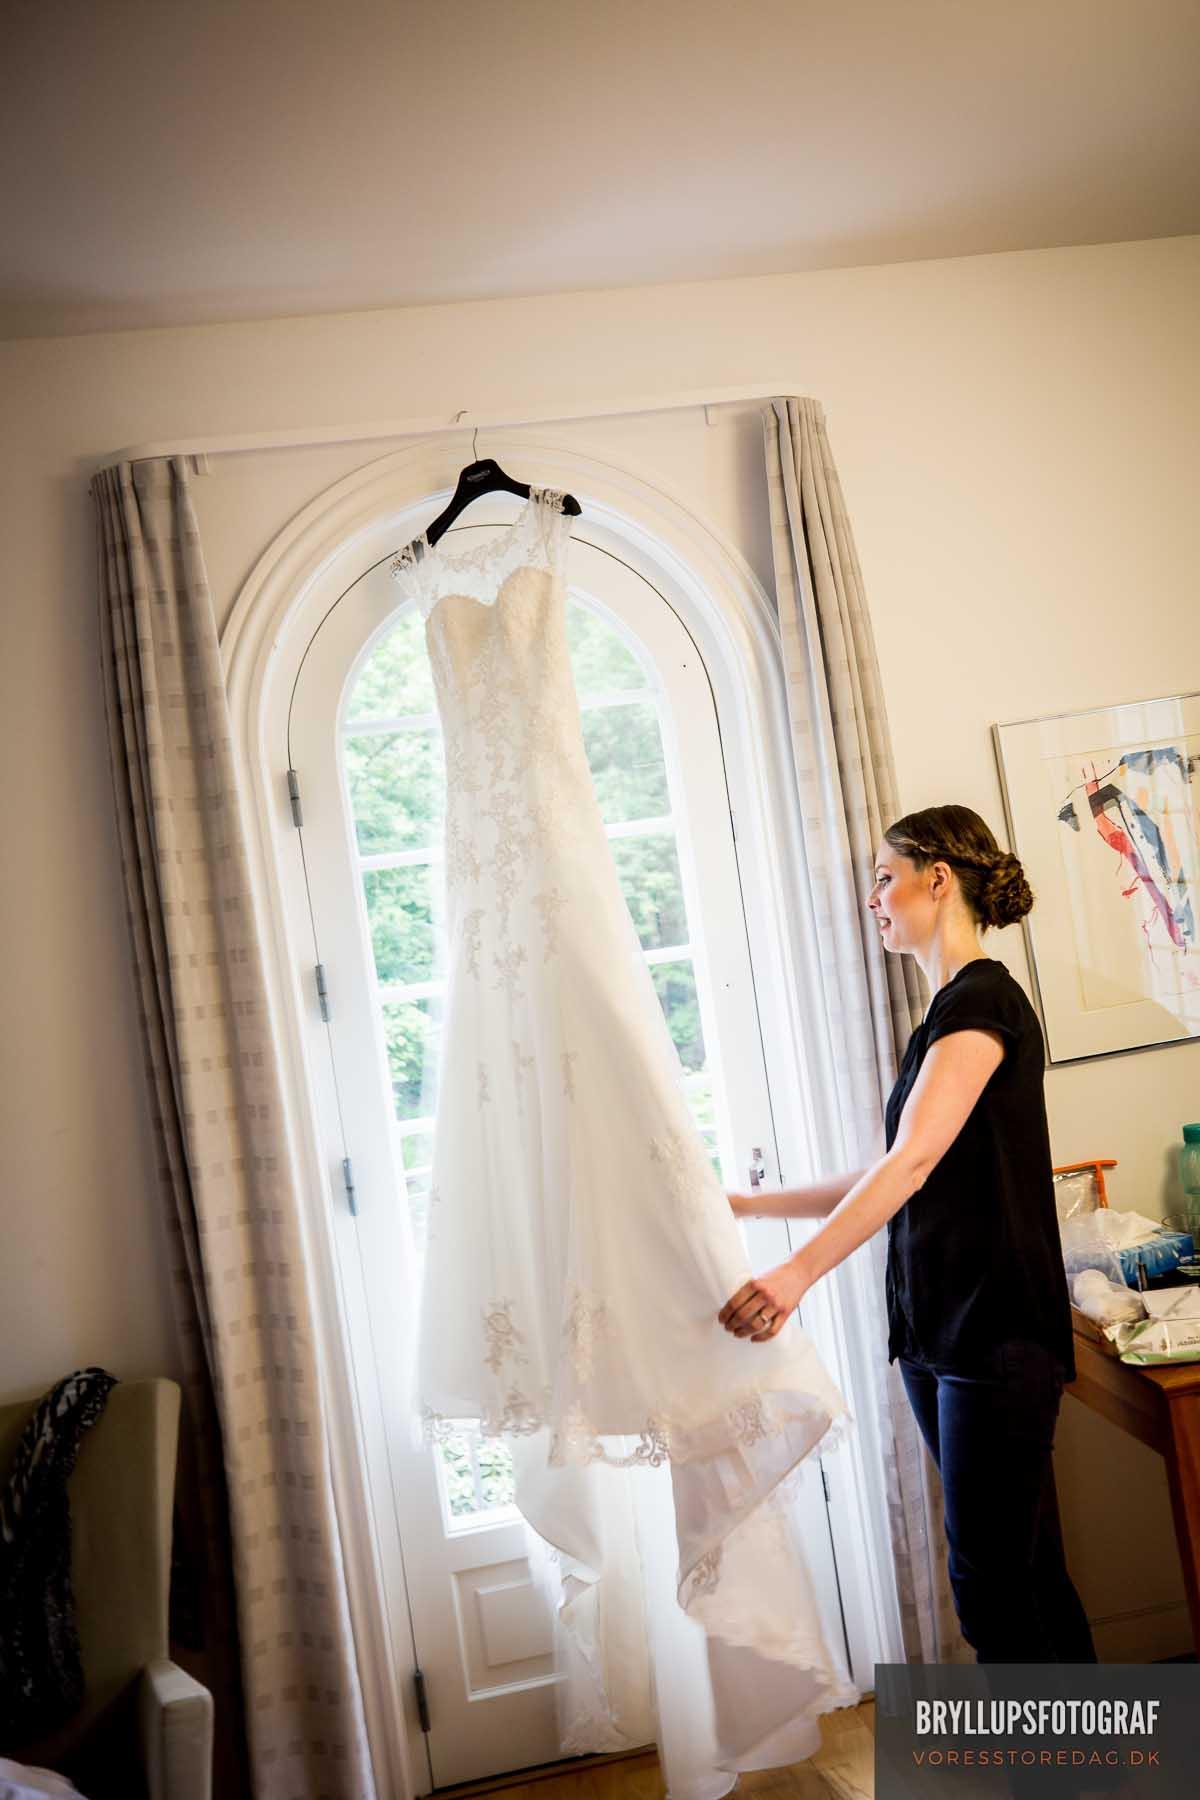 brudekjolen skarrildhus